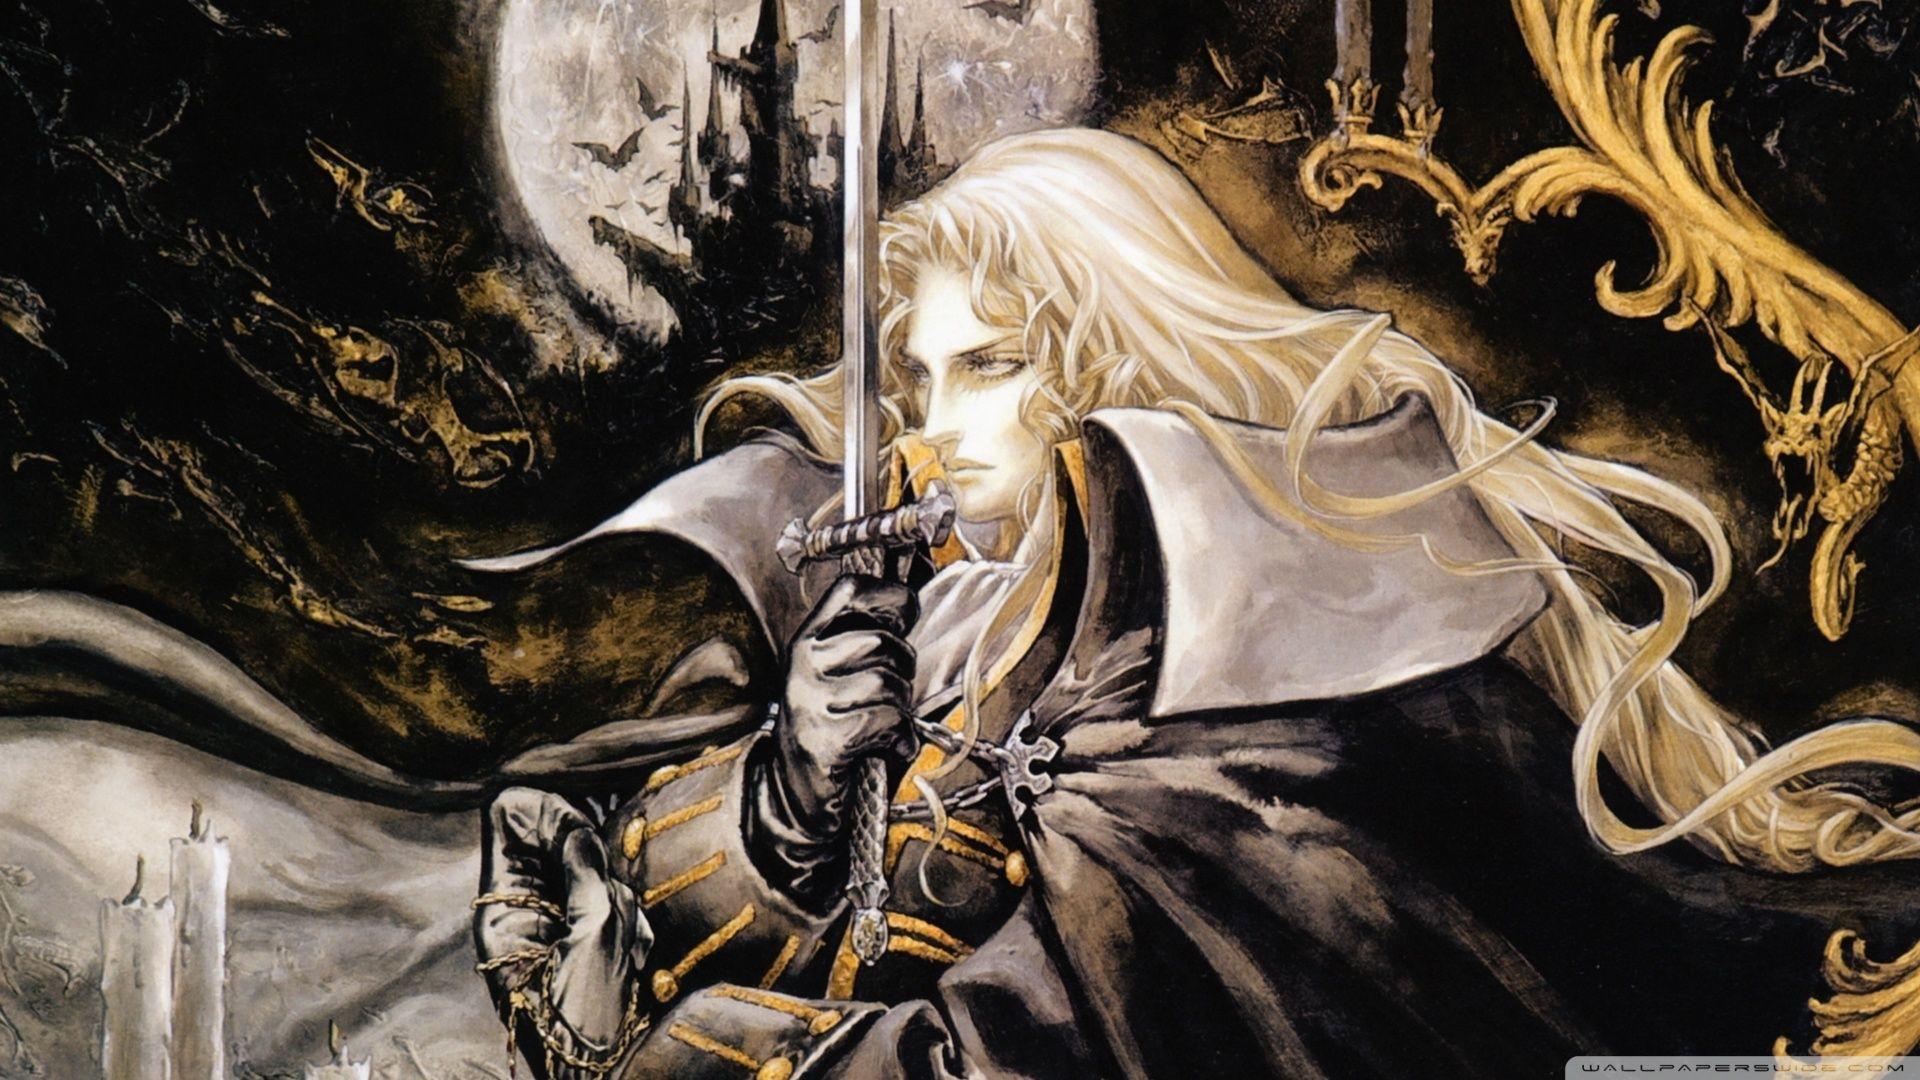 Castlevania Hd Wallpapers Backgrounds Wallpaper Alucard